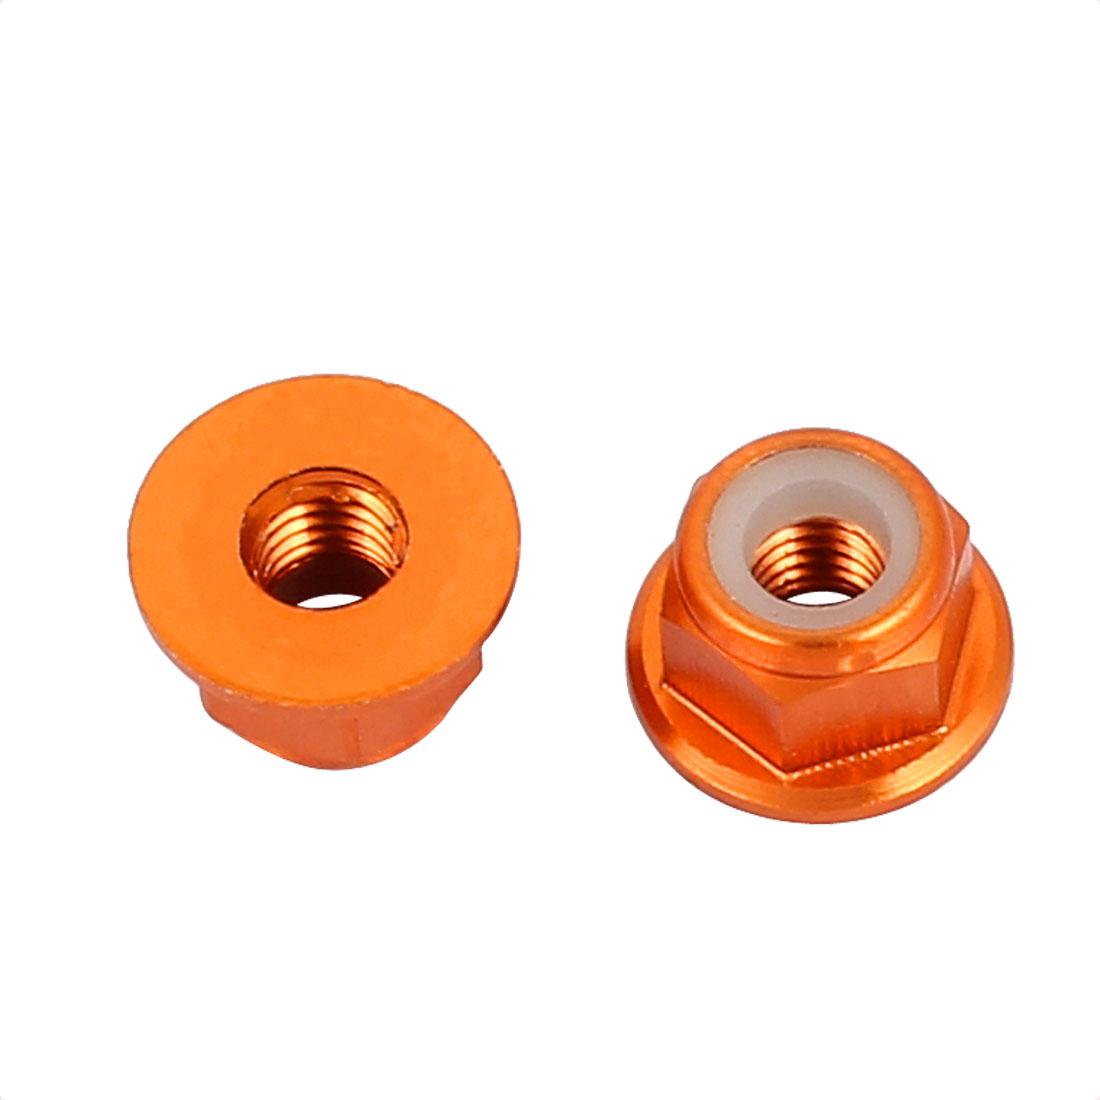 M3 Aluminum Alloy Orange Flange Nut For RC Remote Vehicle DIY 2 Pcs